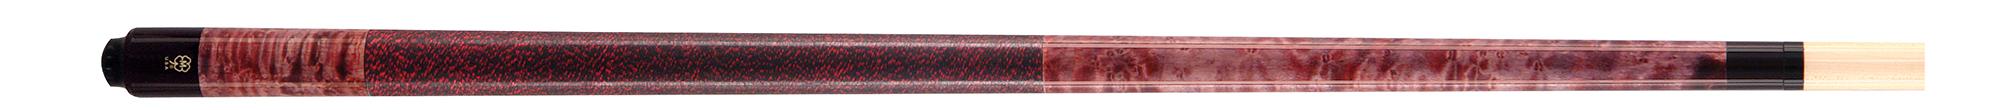 PK3063: McDermott GS09 DW grey/red pool #1